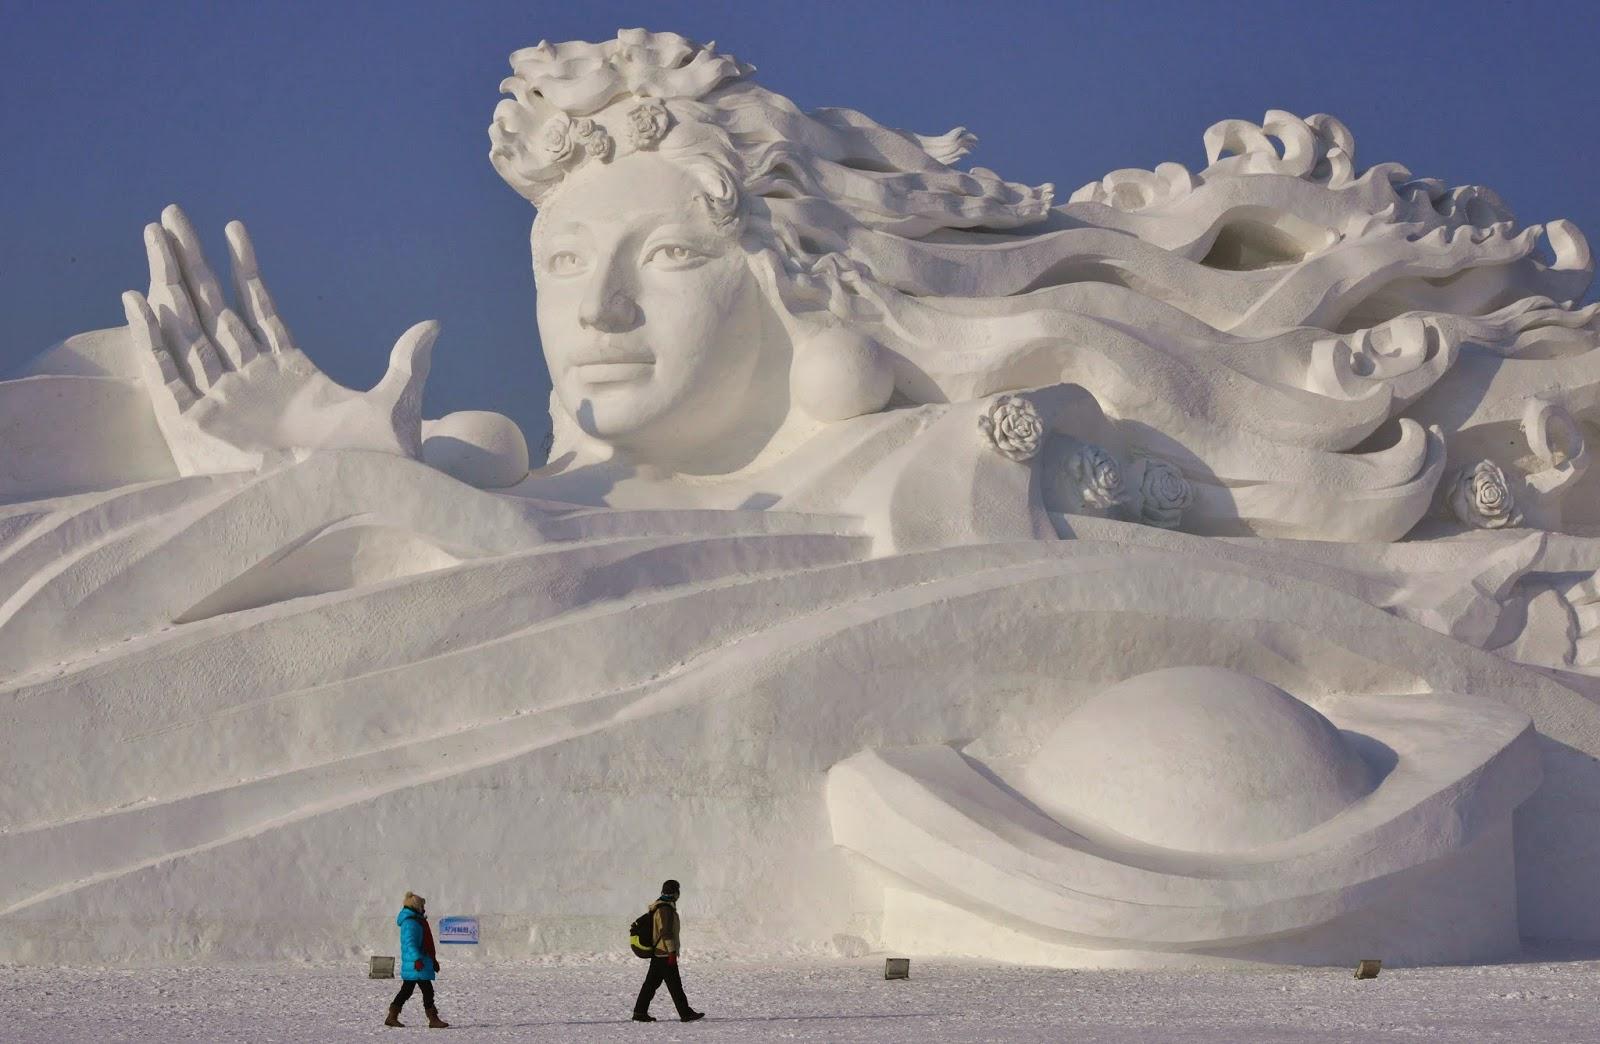 Harbin Ice Sculpture Festival randommusings.filminspector.com